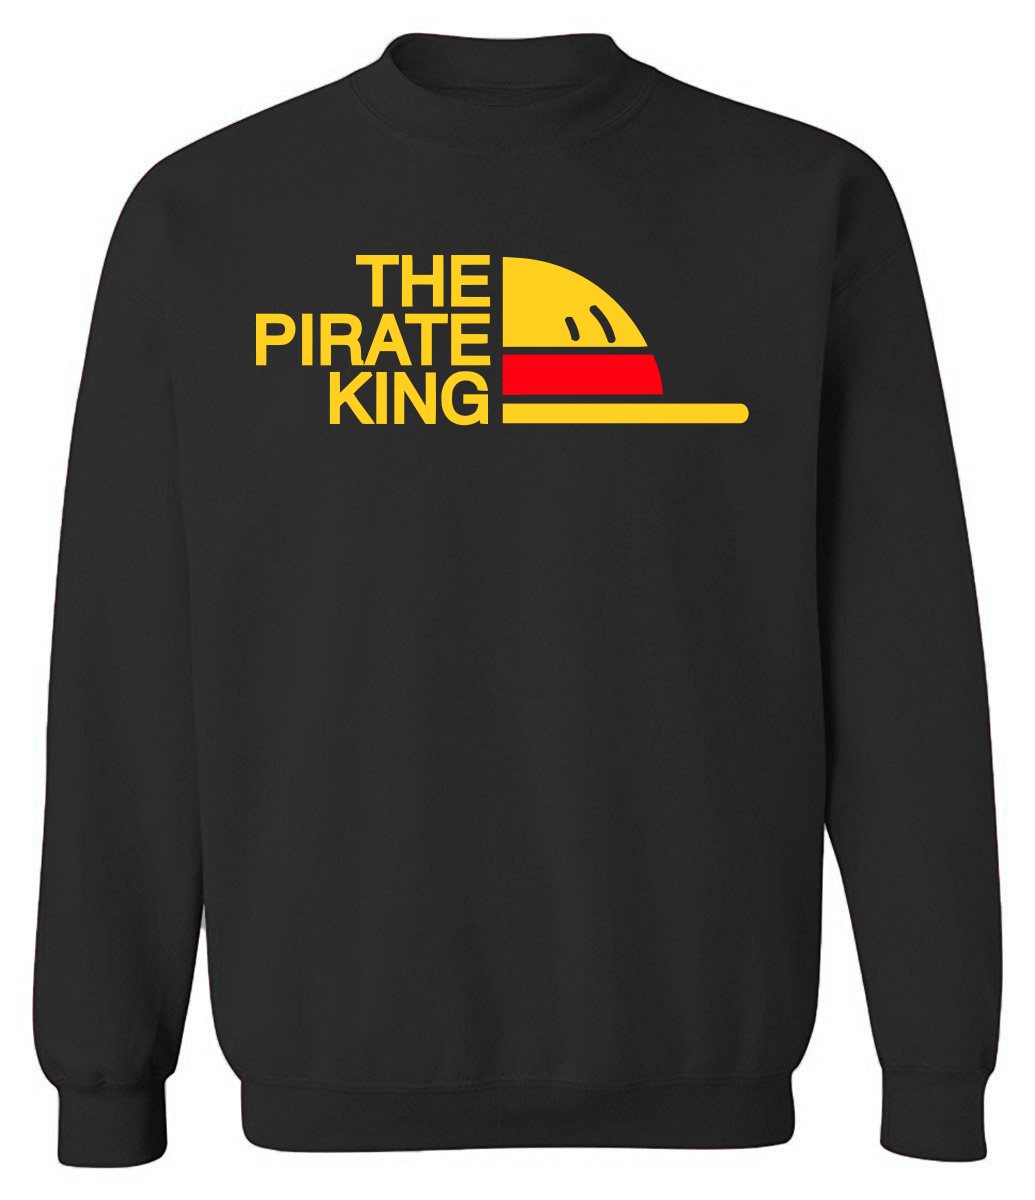 THE PIRATE KING Print Hip Hop Streetwear Hoodies Men 2019 Autumn Winter Men's Sweatshirt ONE PIECE Harajuku Hoodie Hot Pullover